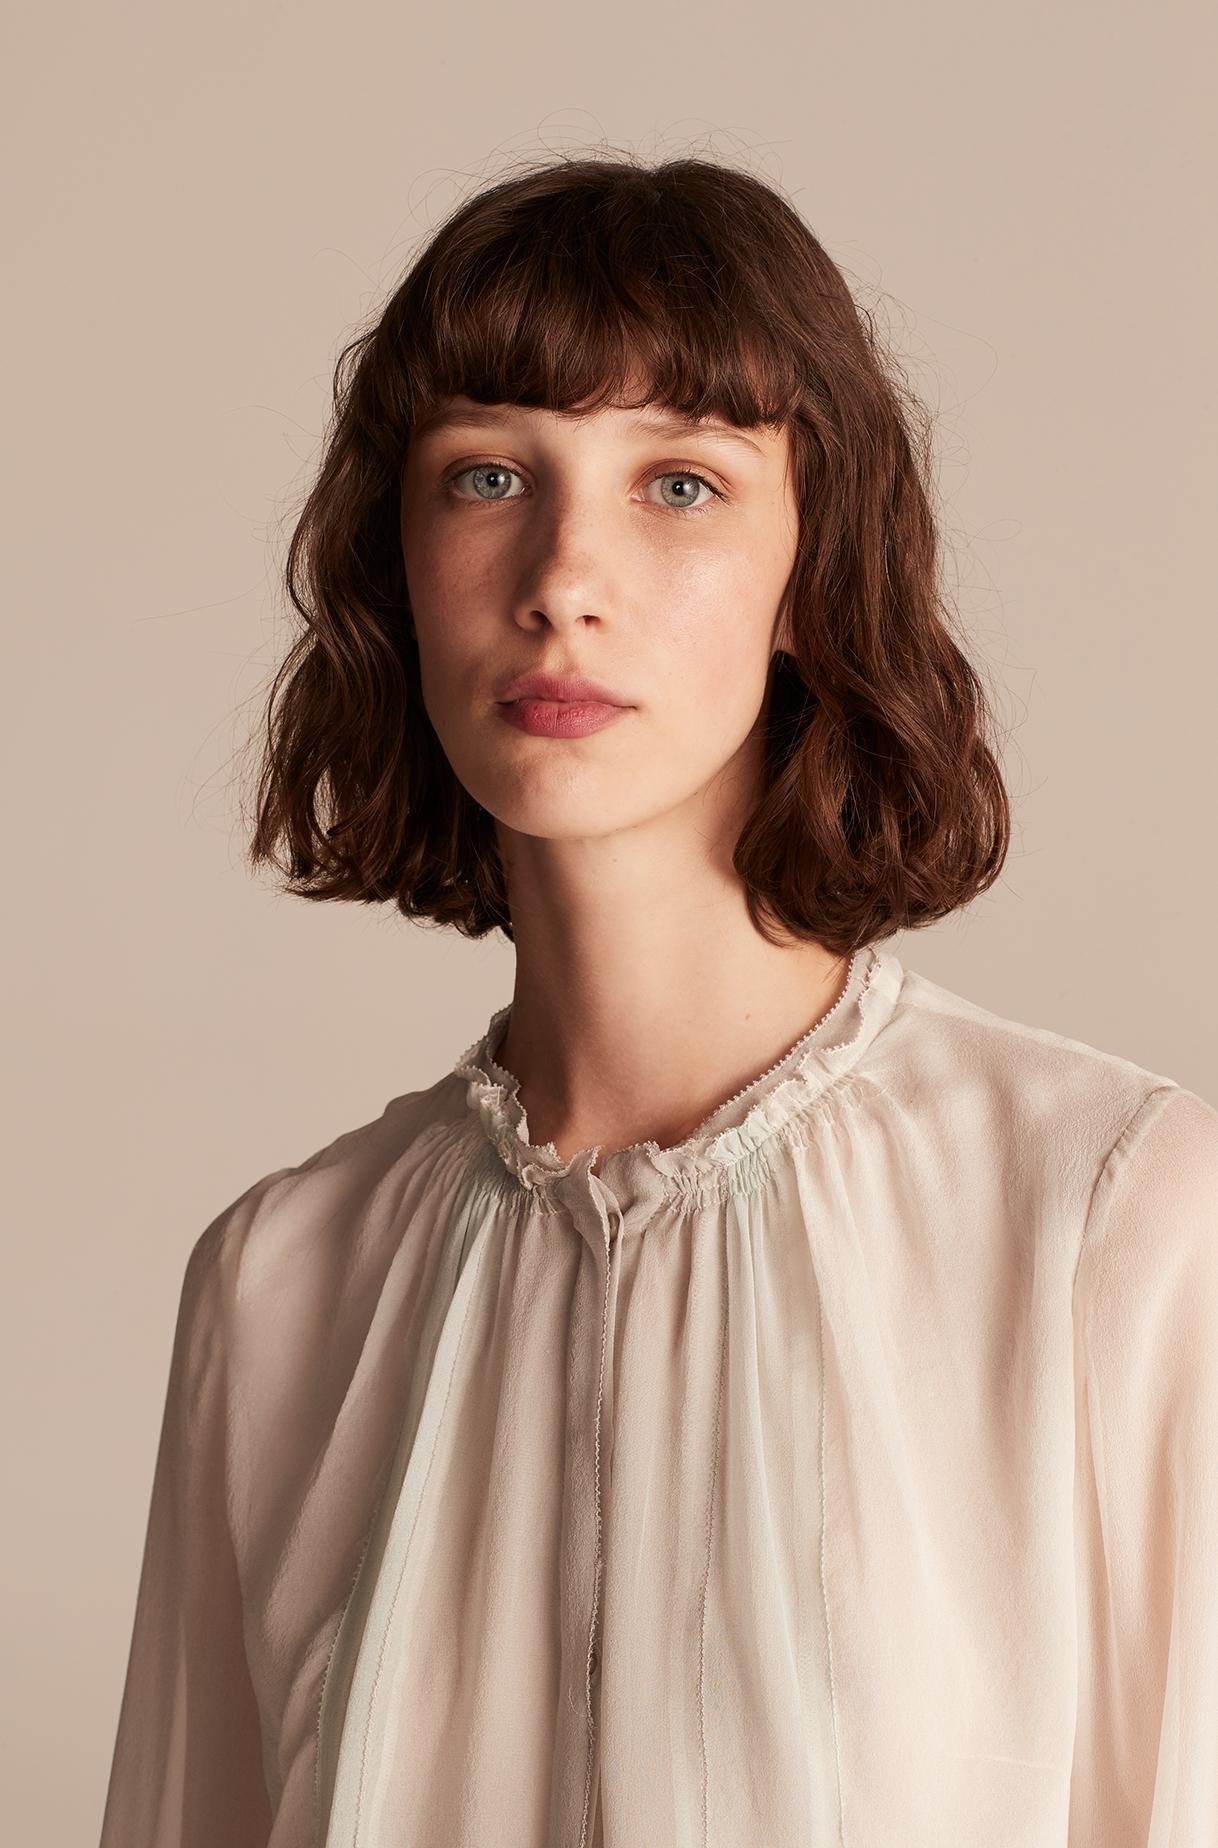 Advertising Imagery for Rebecca Taylor - Model Sasha Knysh I Greg Sorensen I Fashion & Beauty Photographer I NYC